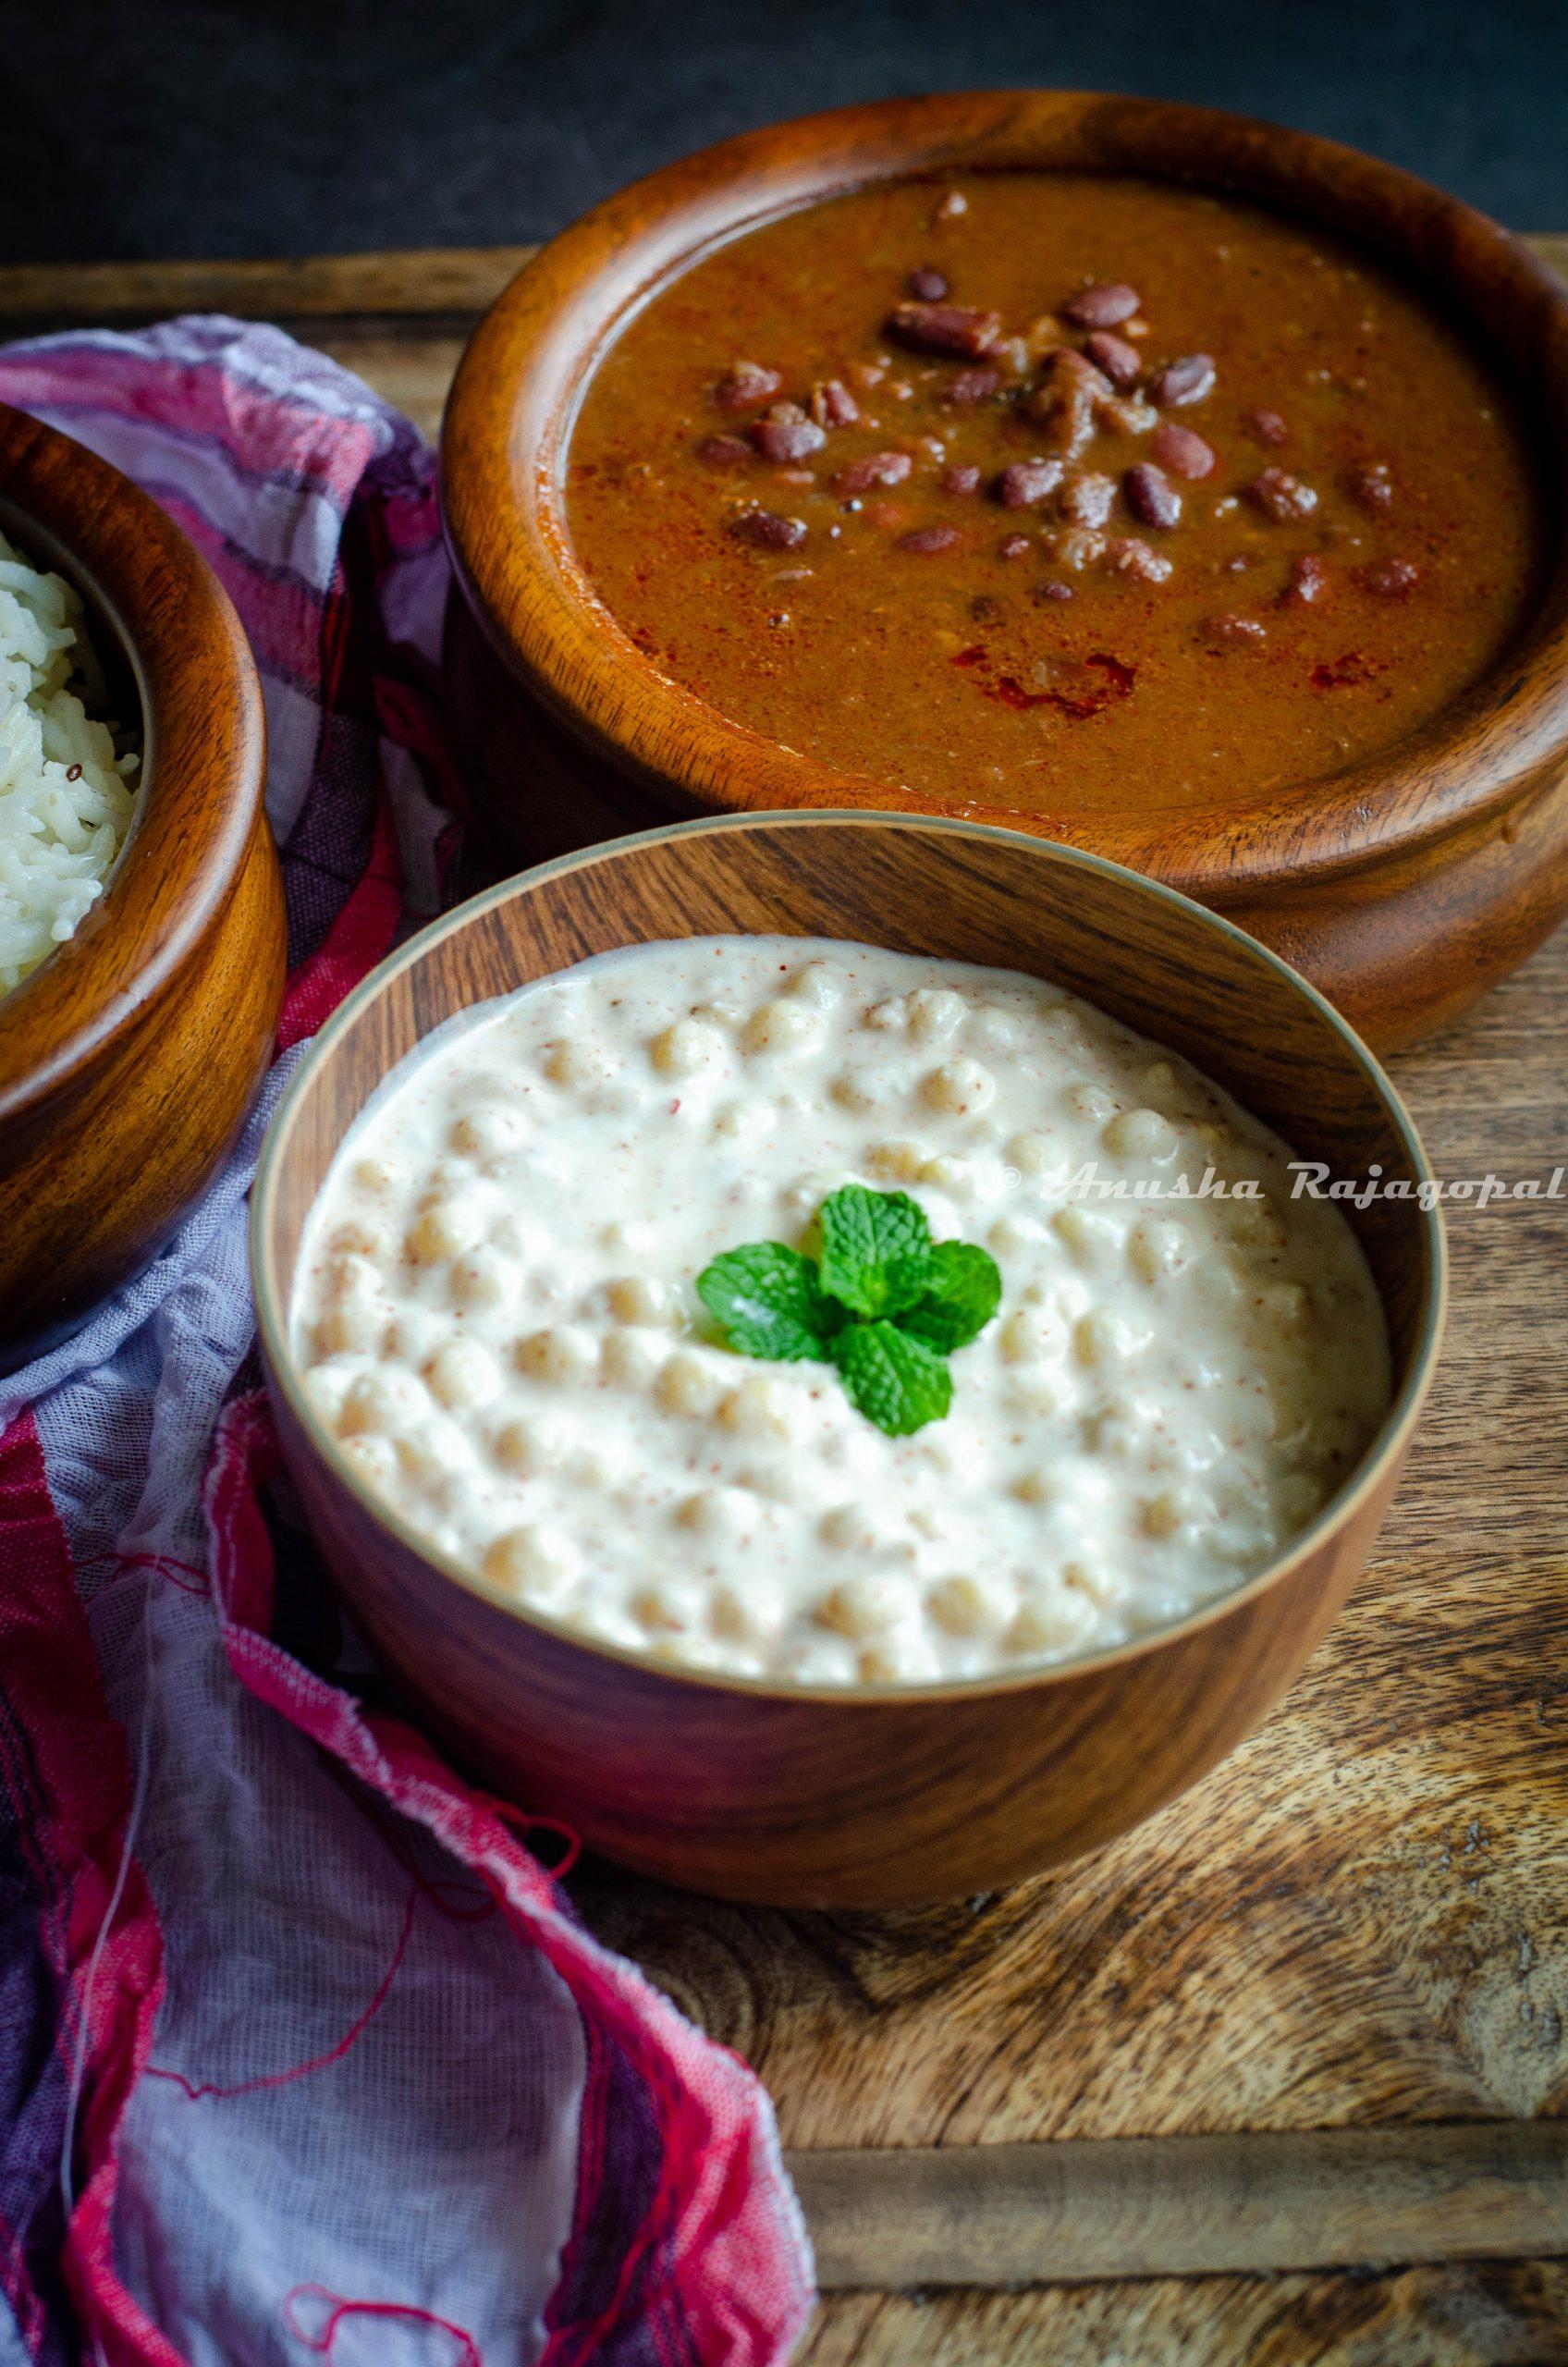 Boondi raita served in a wooden bowl alongside rajma masala